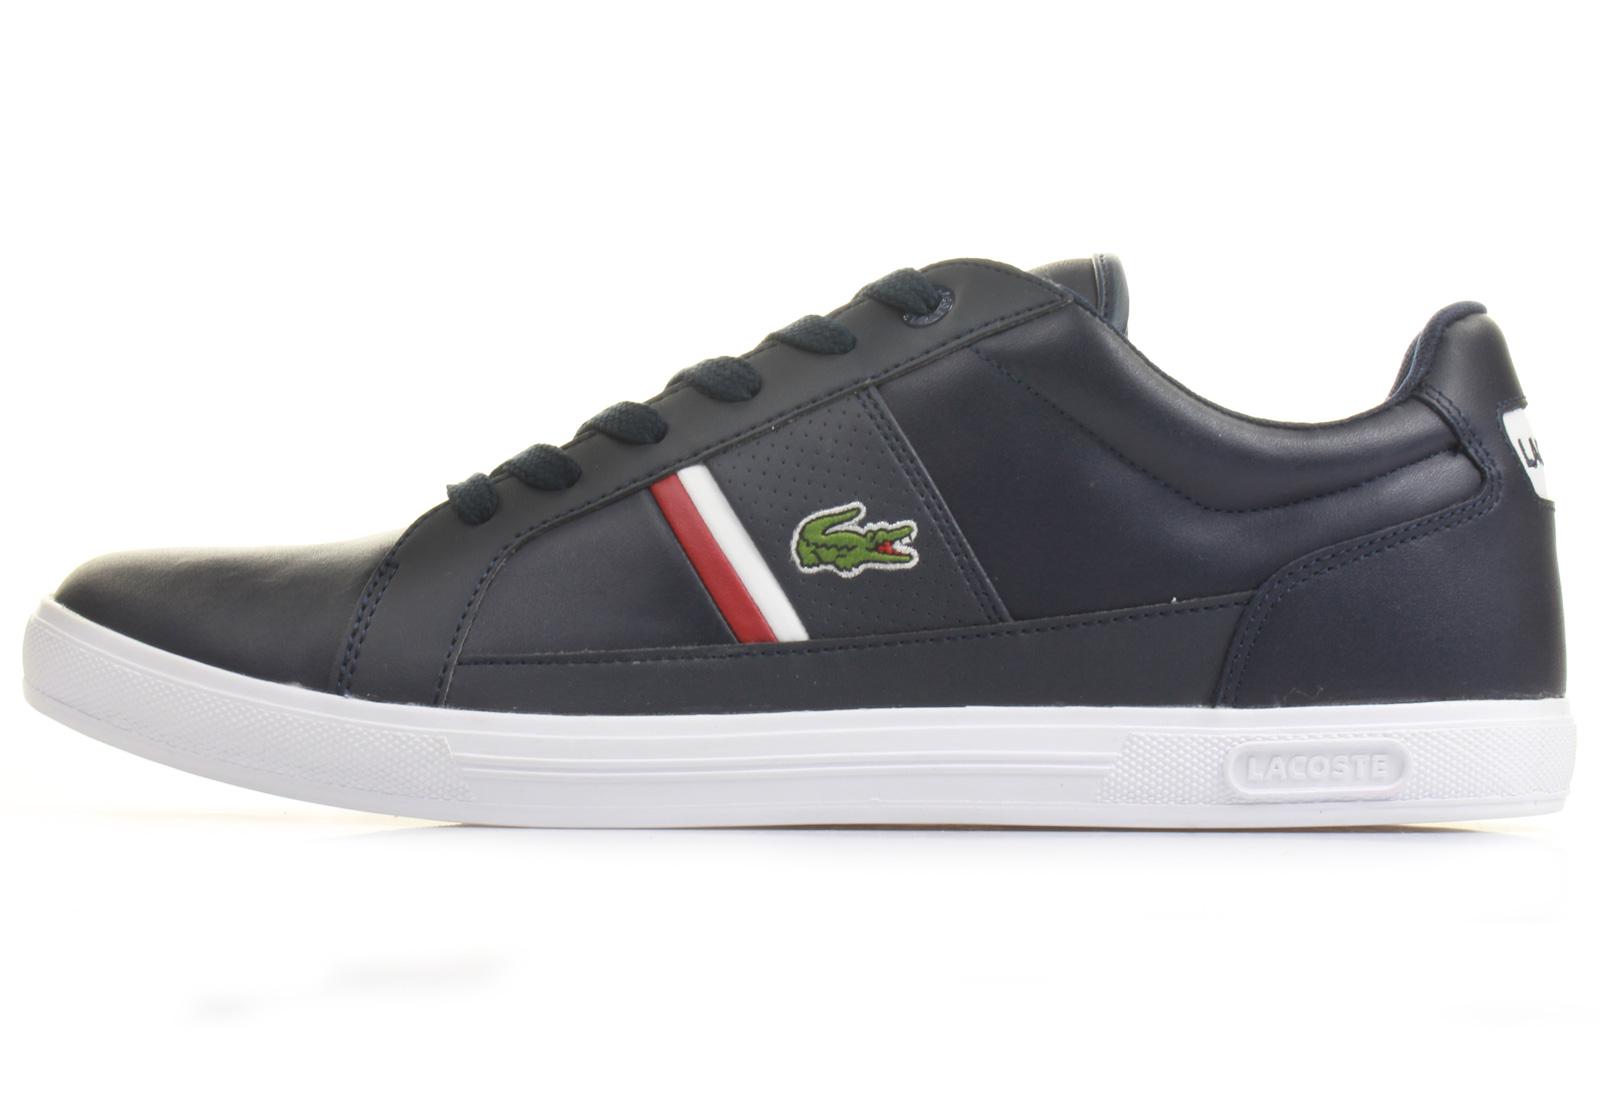 Lacoste Shoes Europa 142spm3026 121 Online Shop For